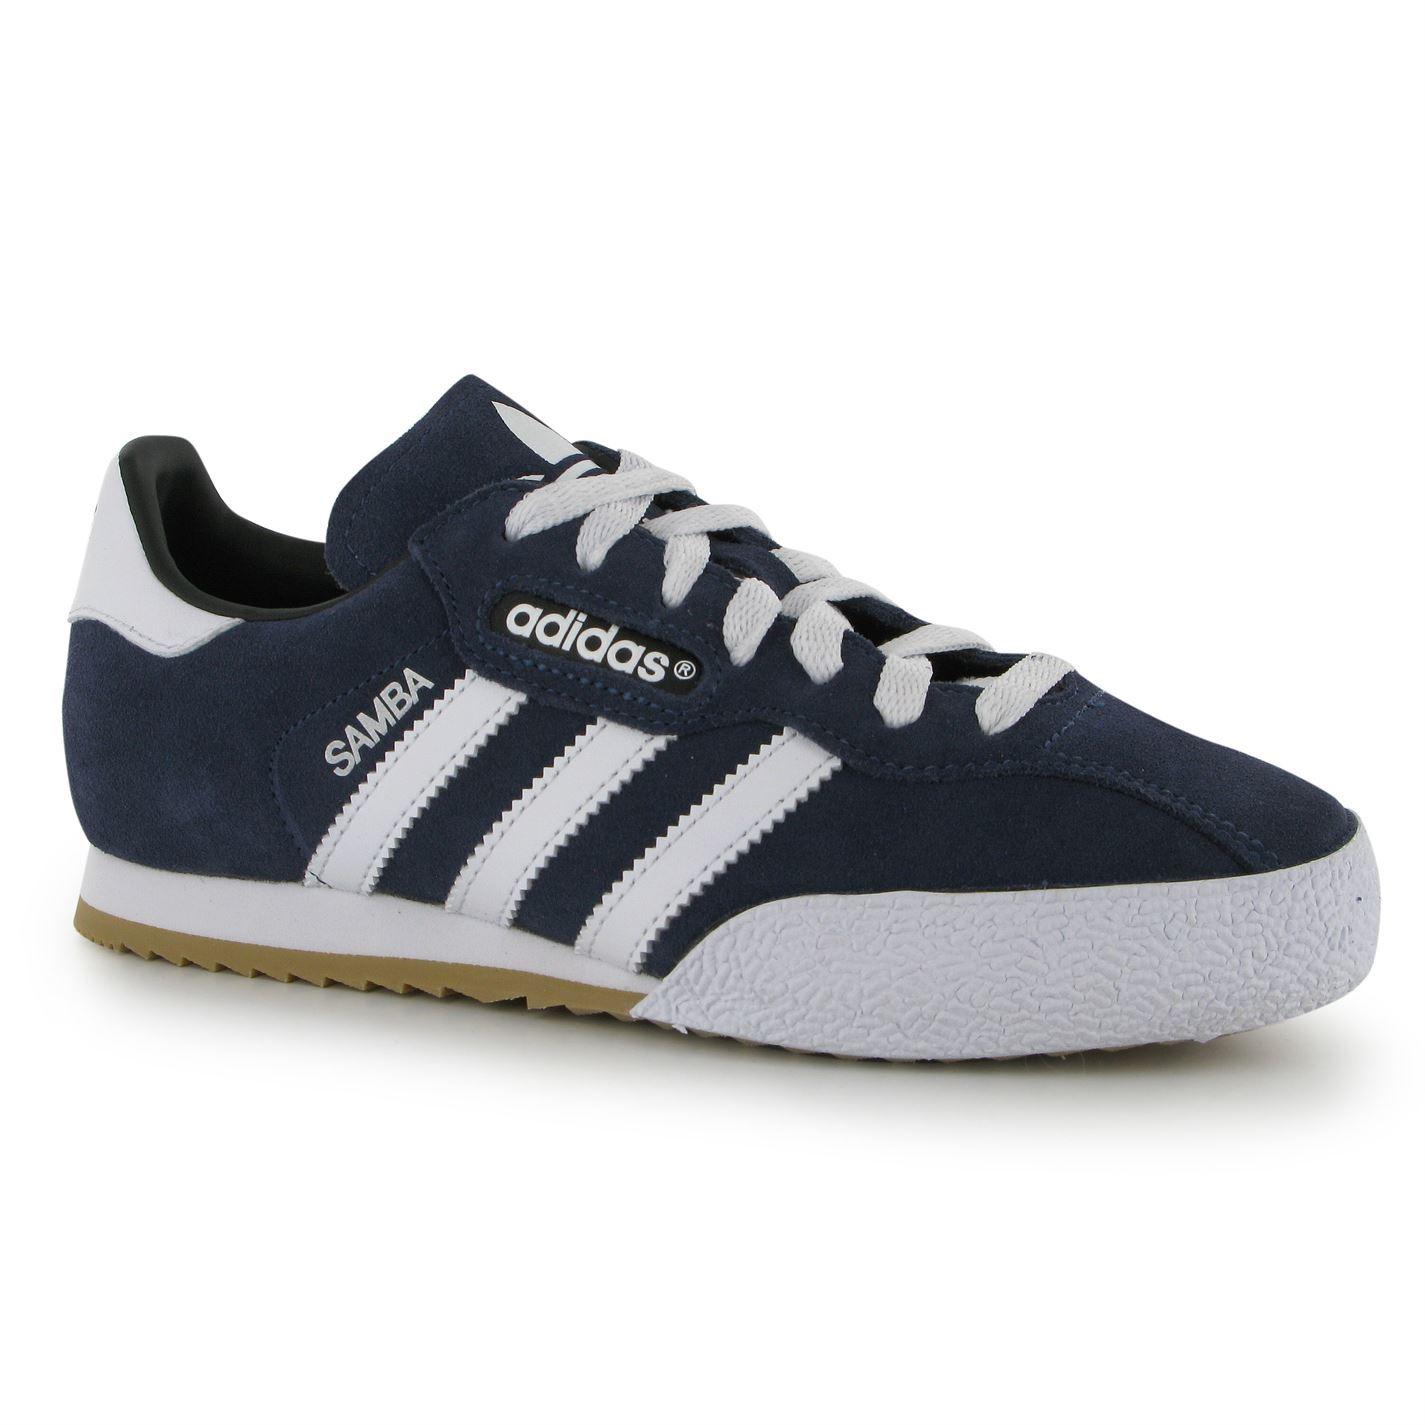 ... Adidas Samba Suede Indoor Football Futsal Trainers Juniors Blue Wht Soccer  Shoes ... 3678de1cd58